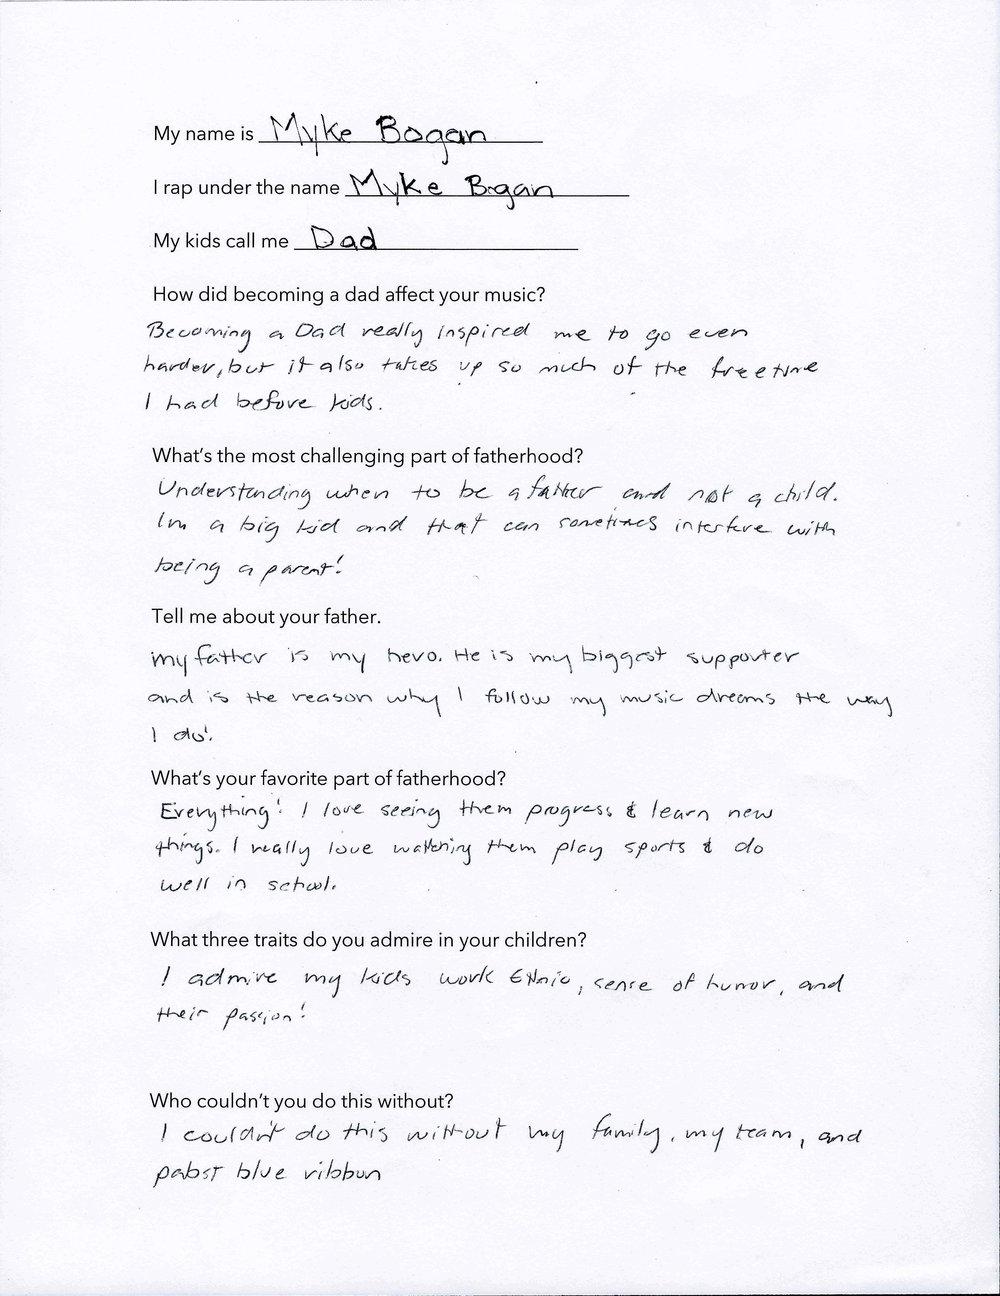 Myke Bogan's Questionnaire